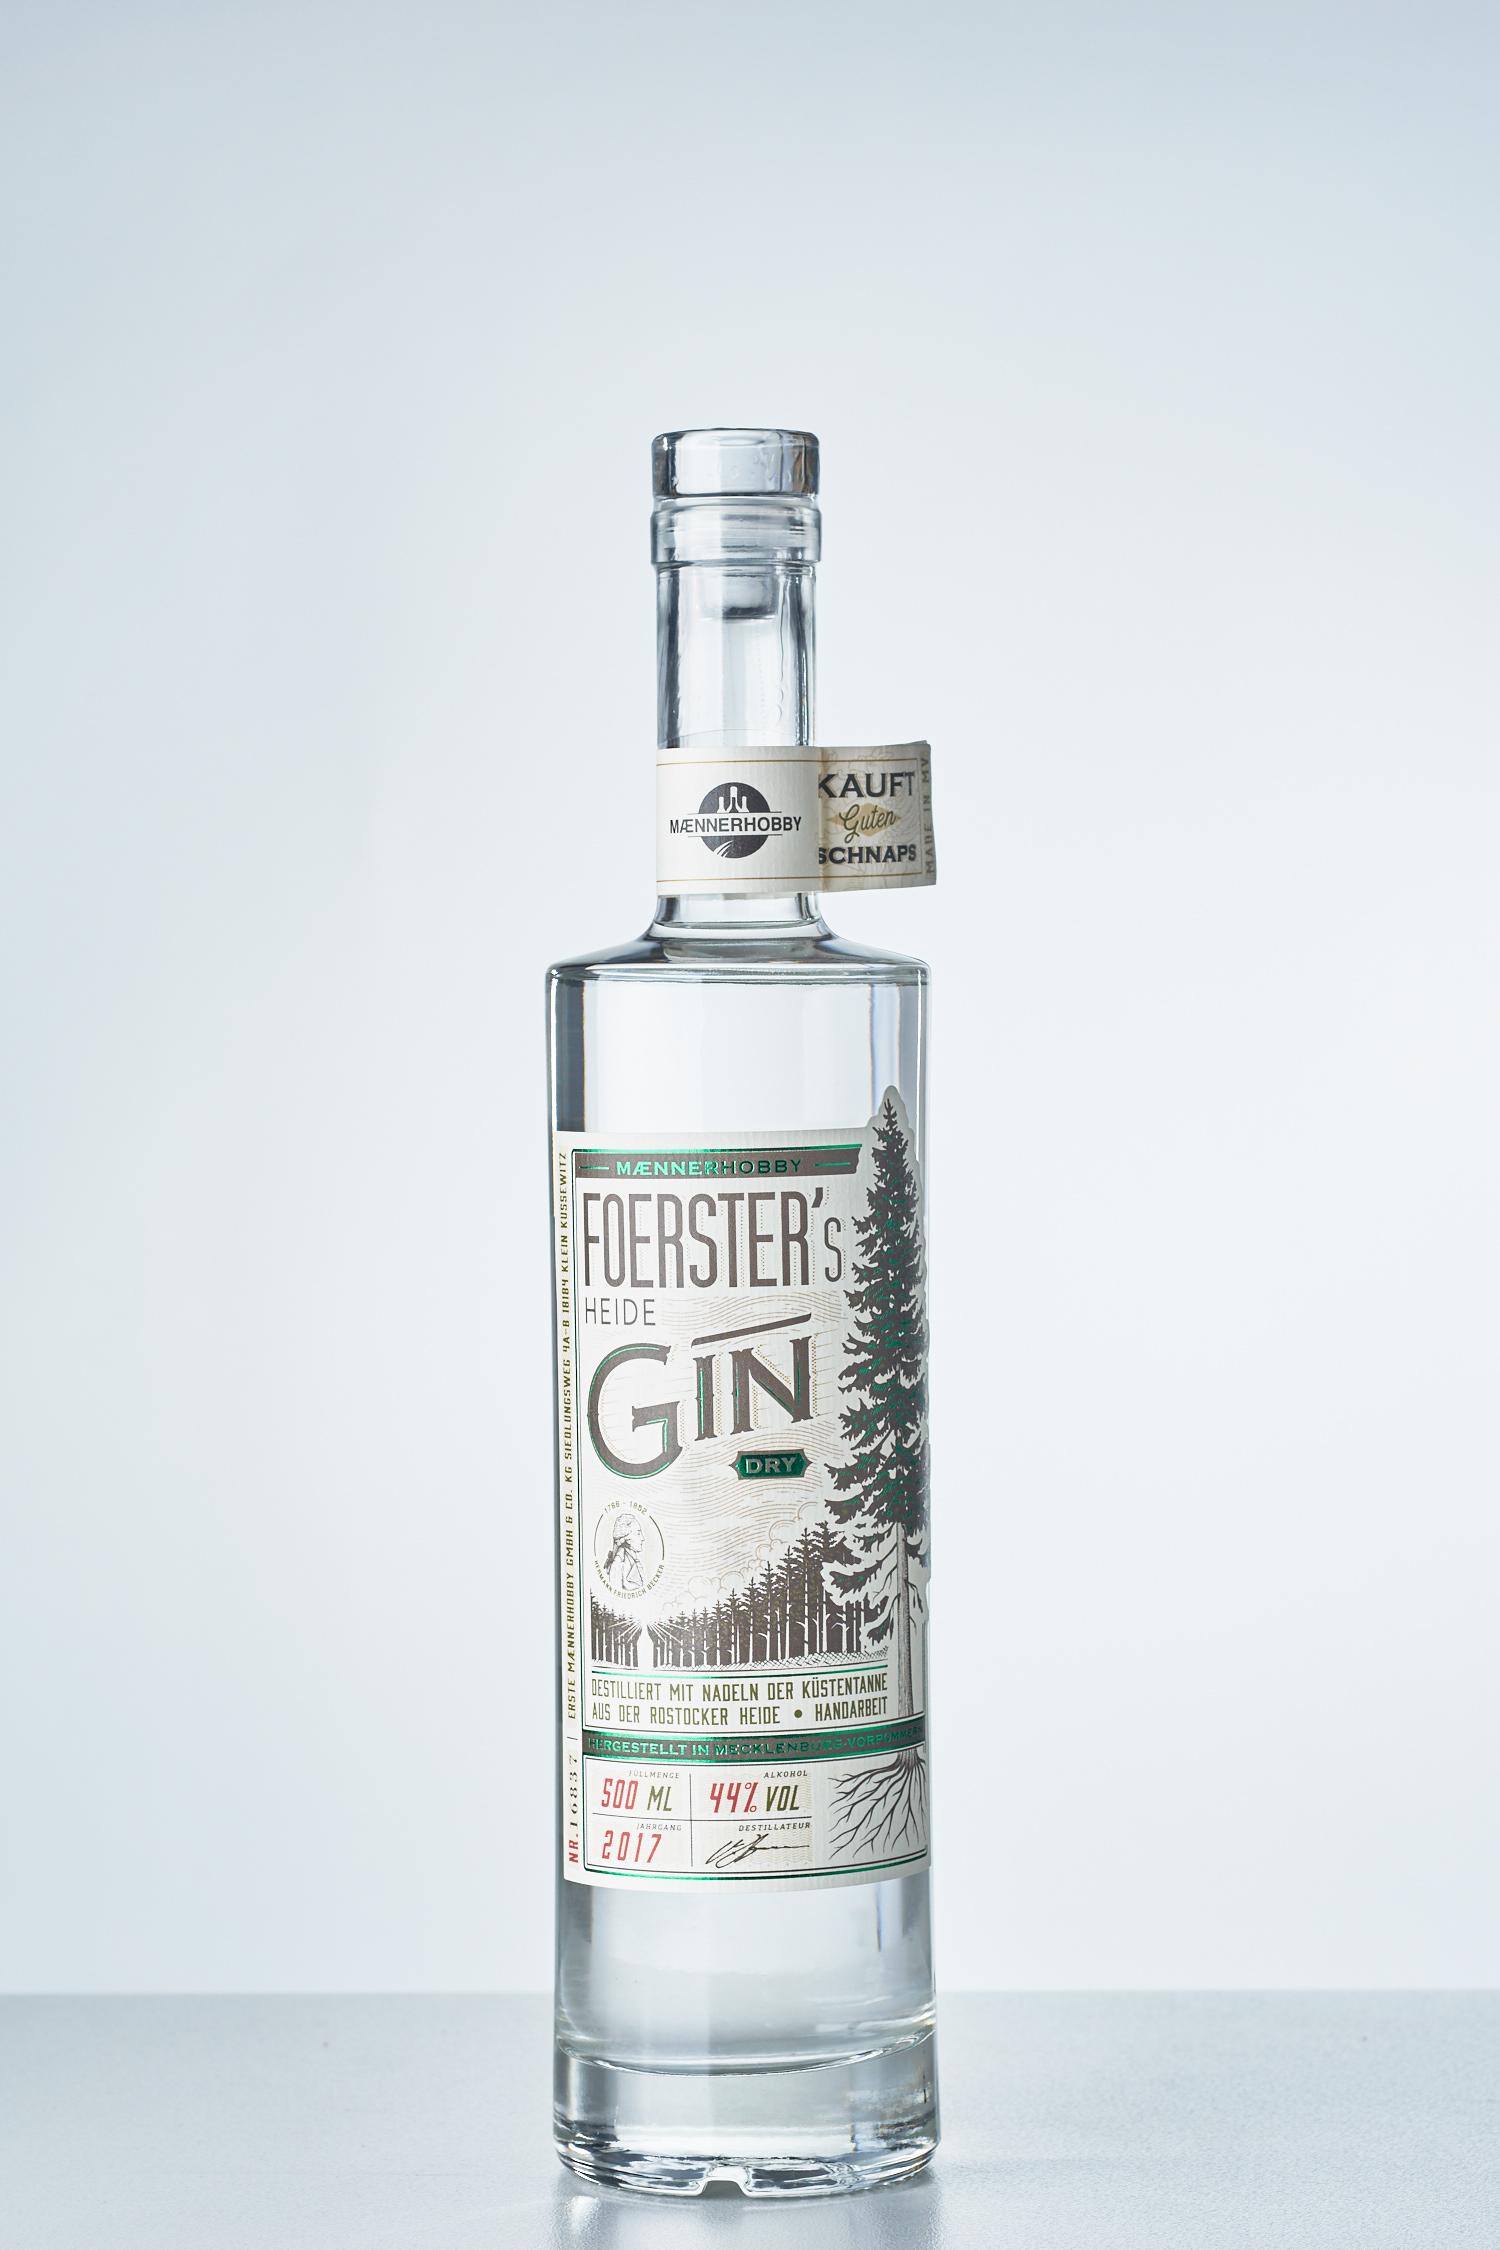 Erste MAENNERHOBBY - FOERSTERs Heide Gin